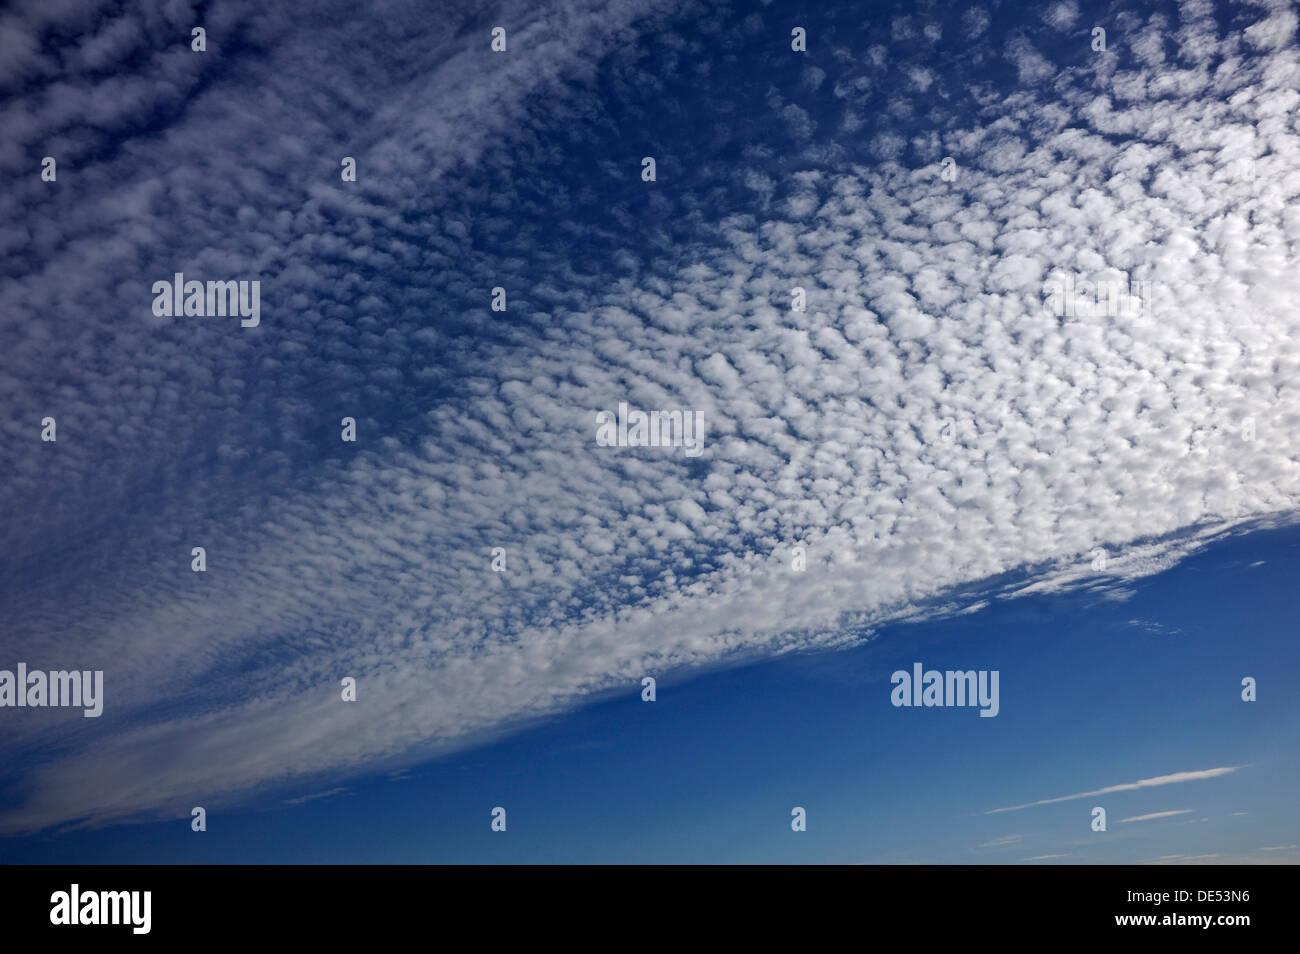 Fluffy clouds or cirrocumulus clouds, Bentin, Rögnitz, Mecklenburg-Western Pomerania, Germany - Stock Image